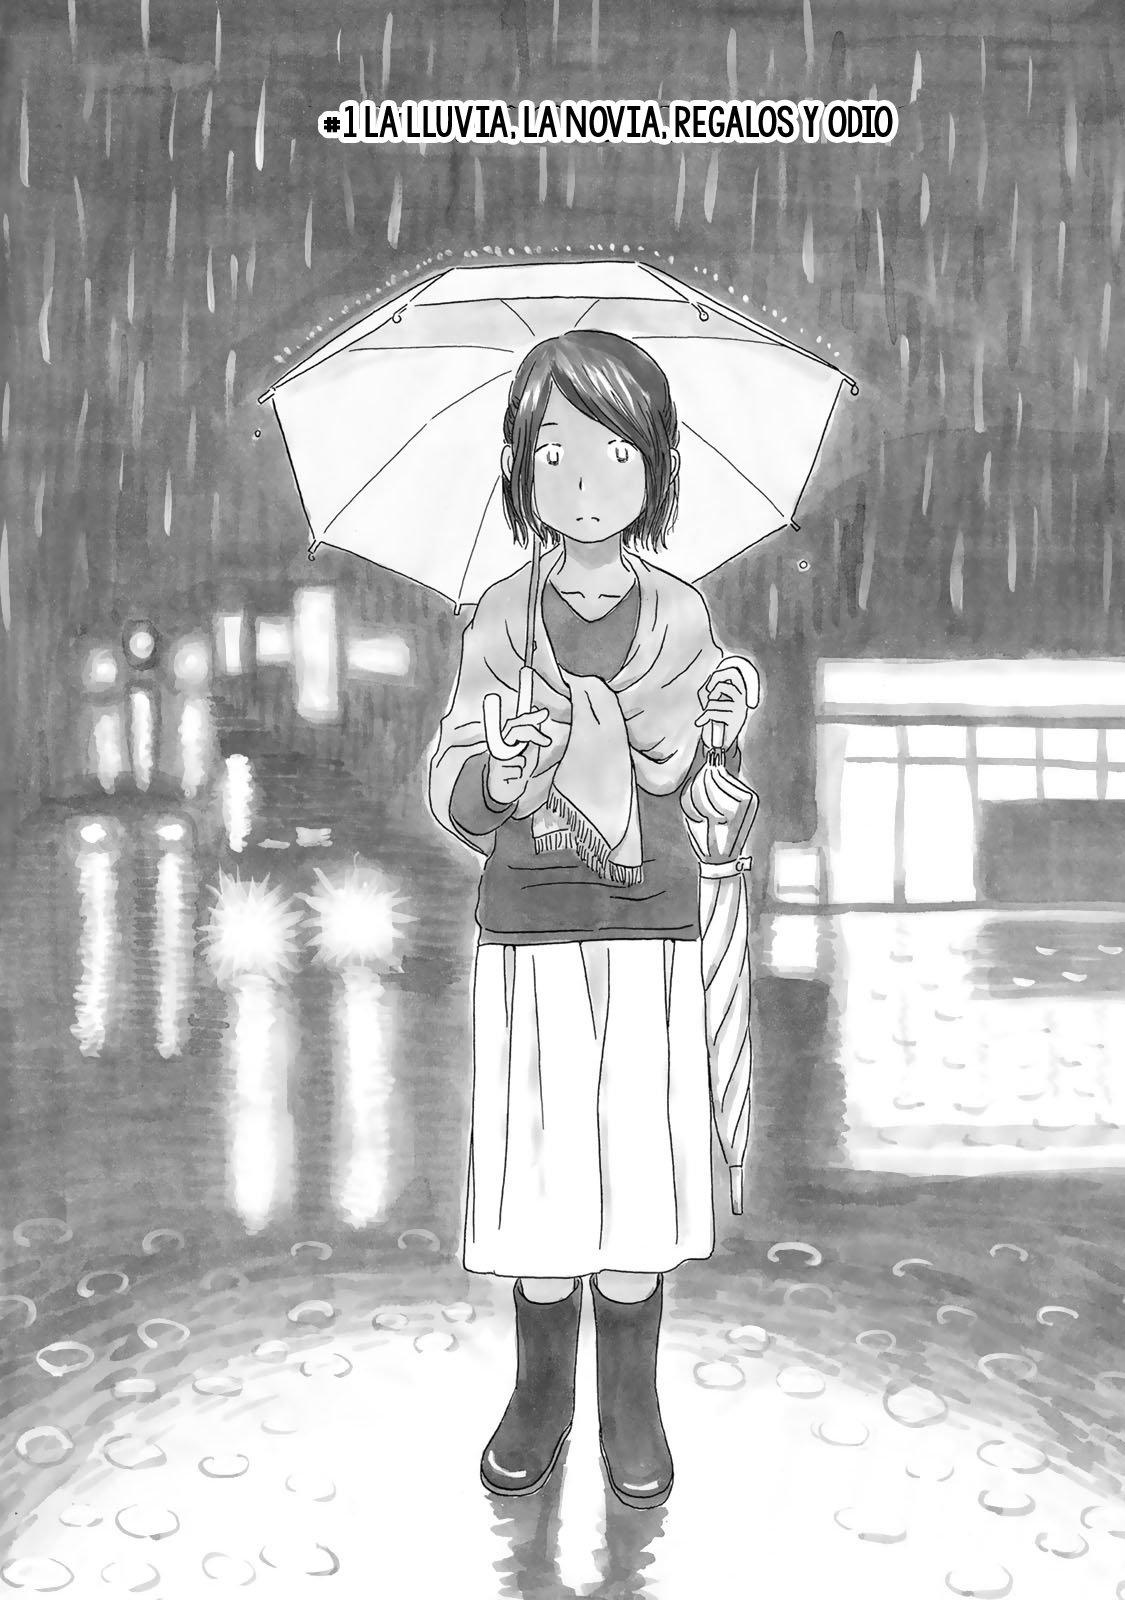 https://nine.mangadogs.com/es_manga/pic8/50/36658/946317/16046315a9051a8e1c614994e8863192.jpg Page 5